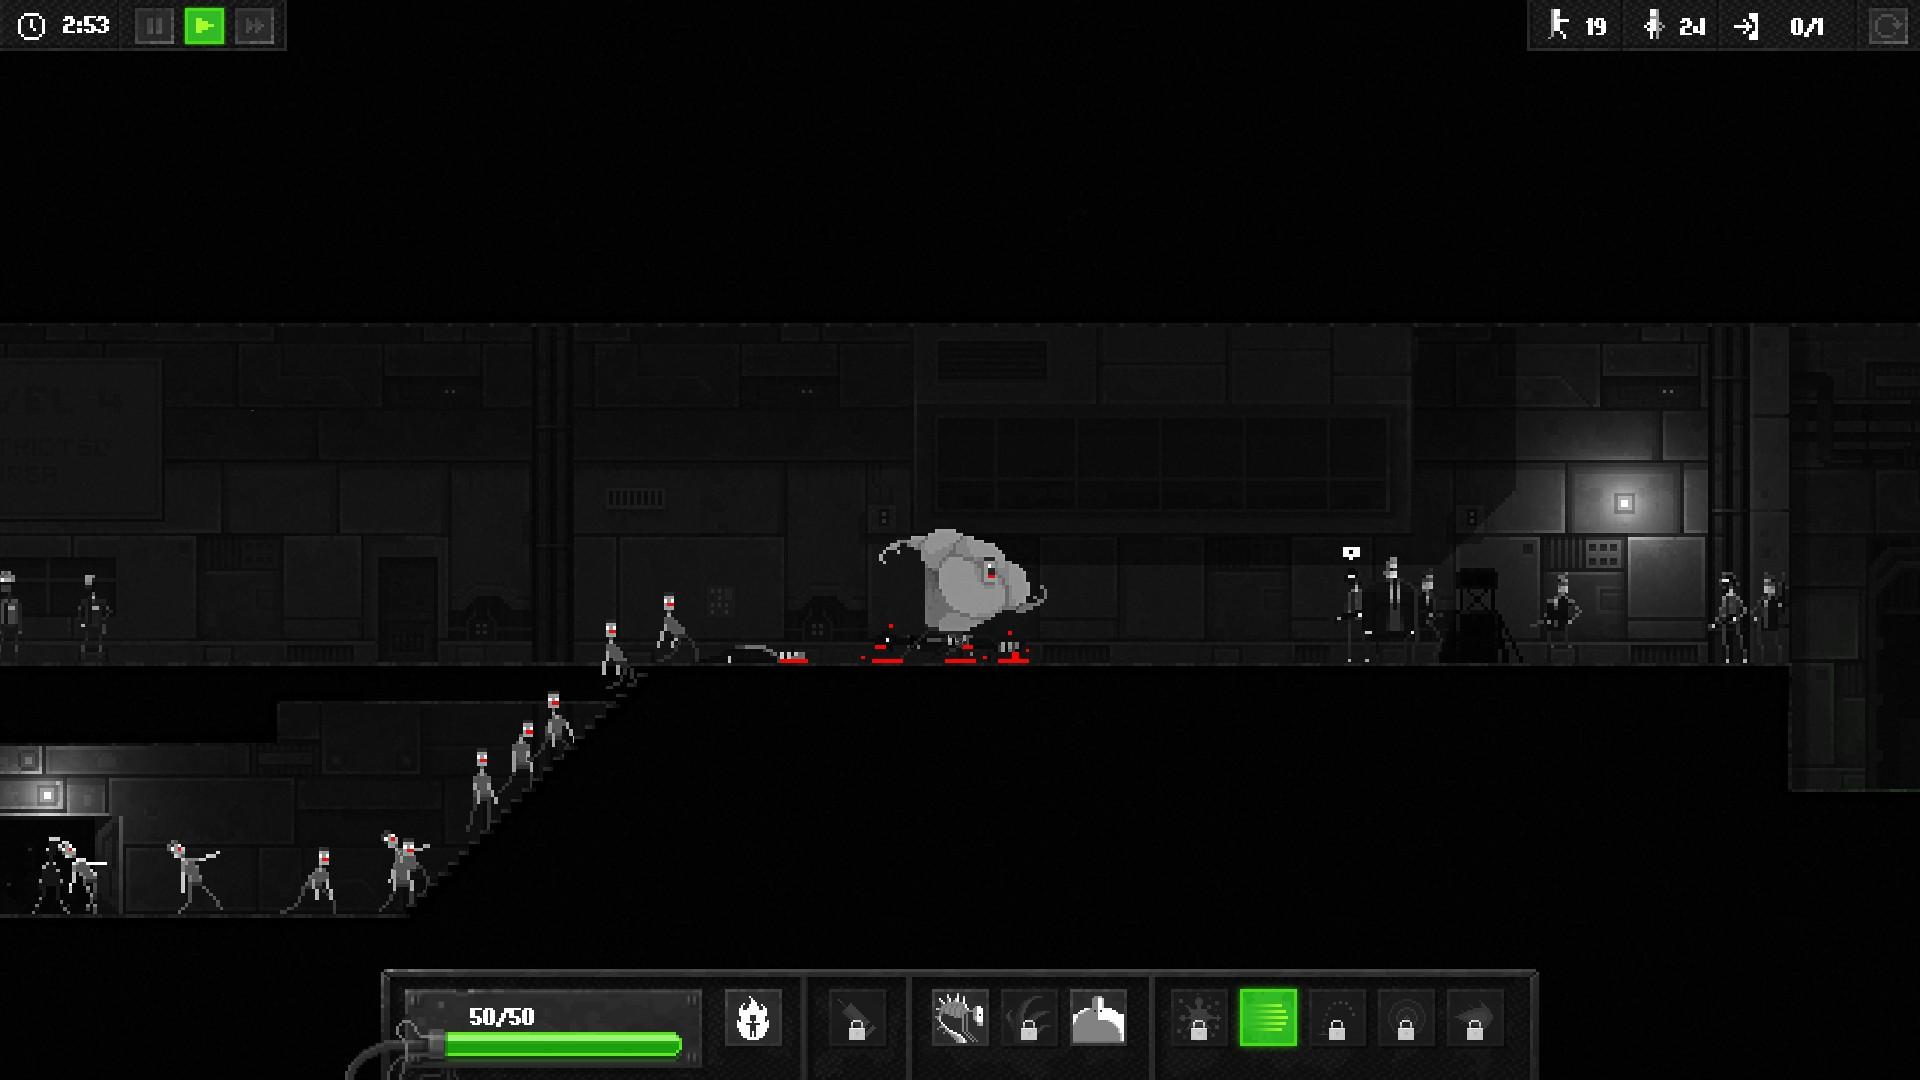 I Walk Among Zombies Screenshot 3